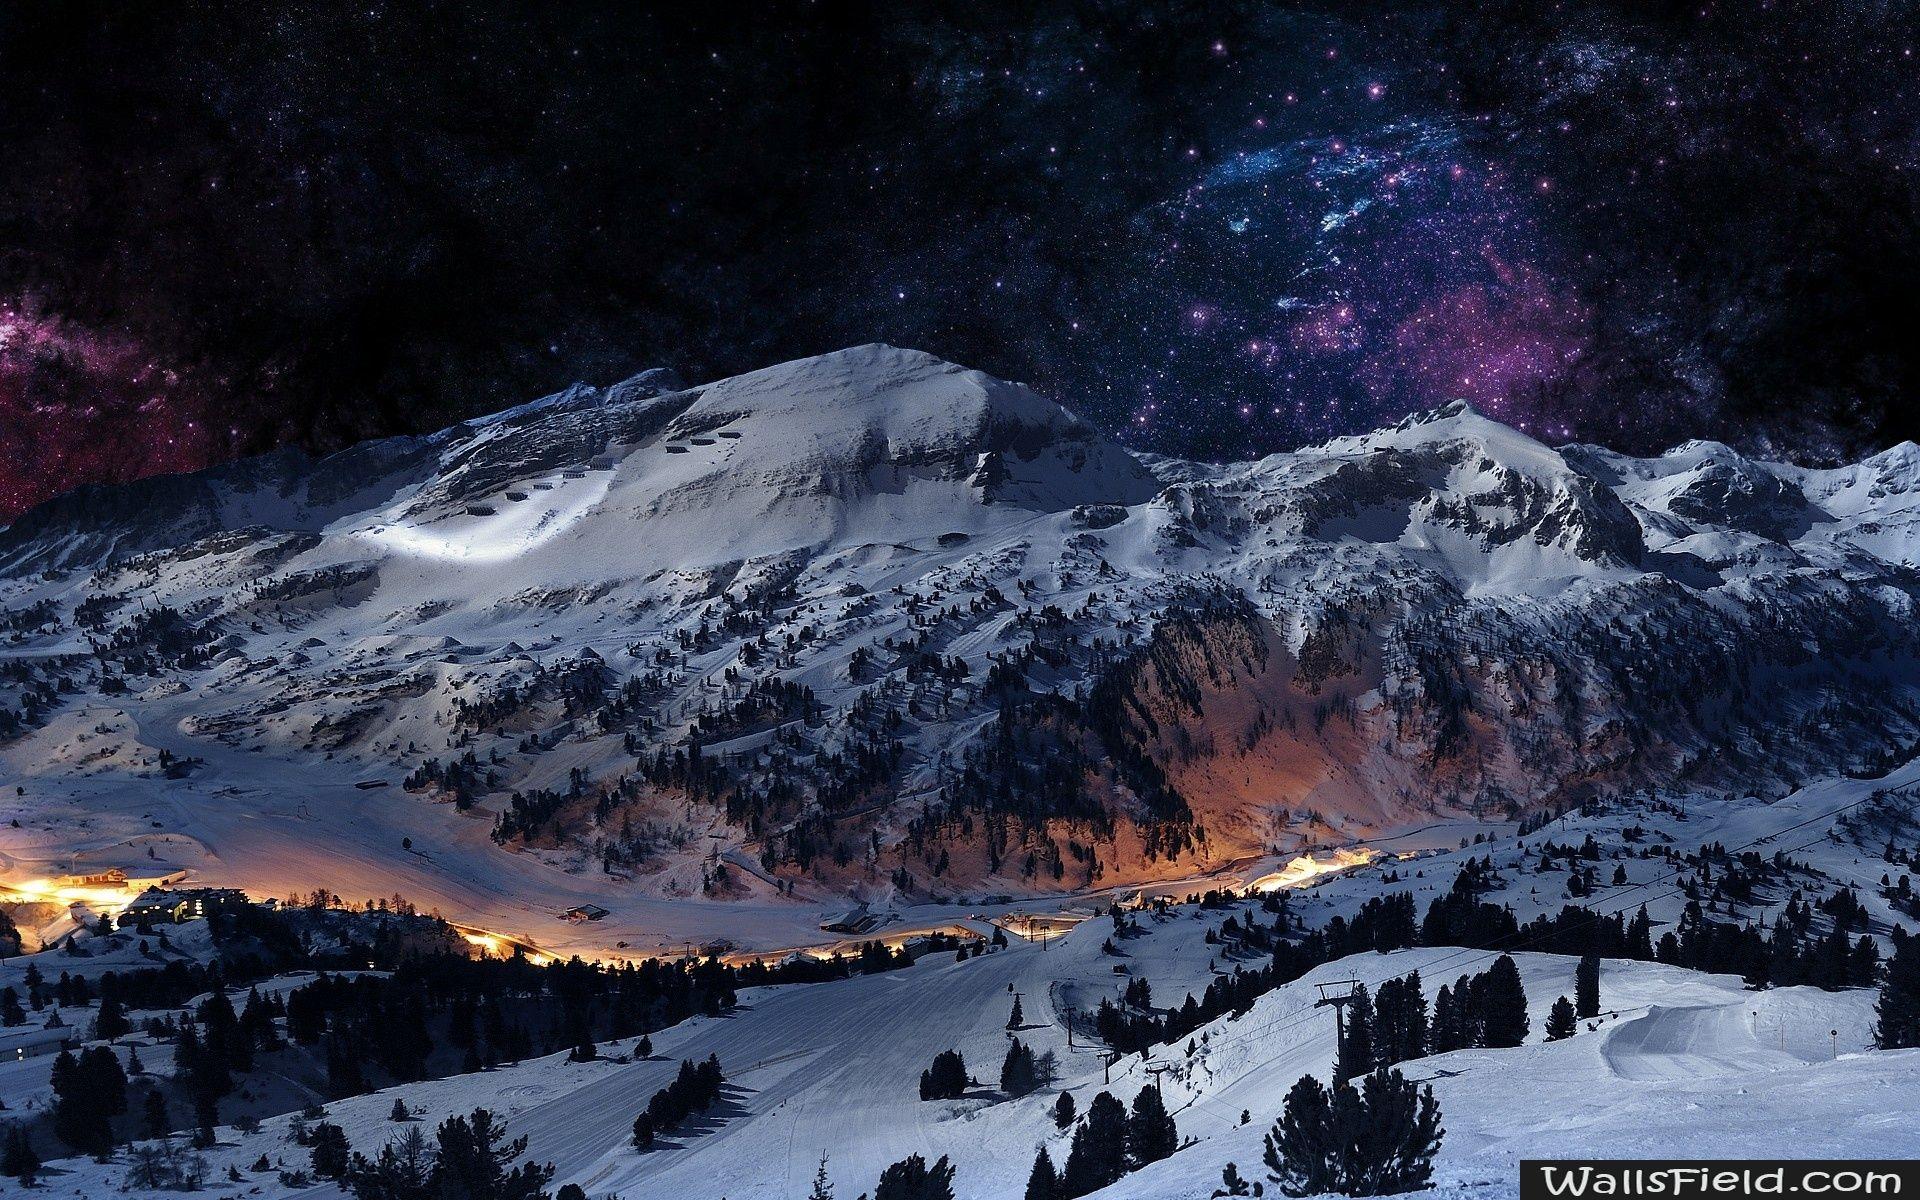 Night Sky Snow Mountains At Night Mountain Wallpaper